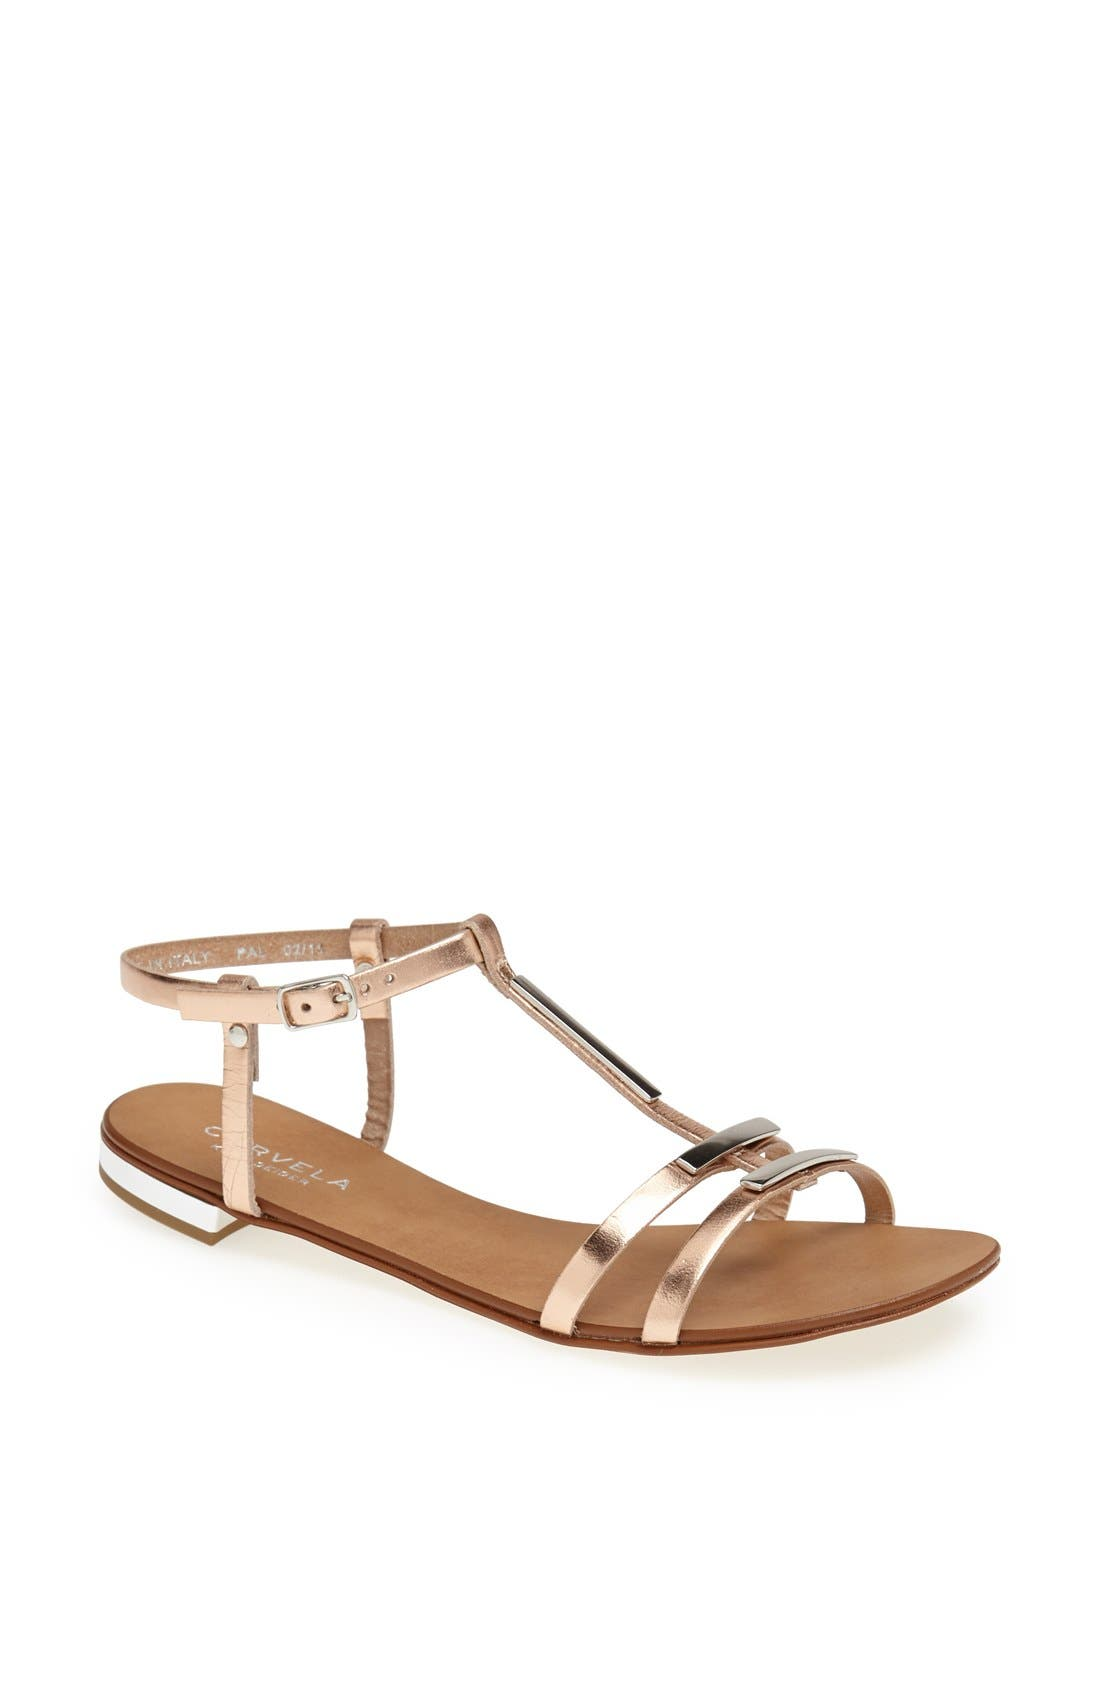 Main Image - Carvela Kurt Geiger 'Kinetic' Flat Sandal